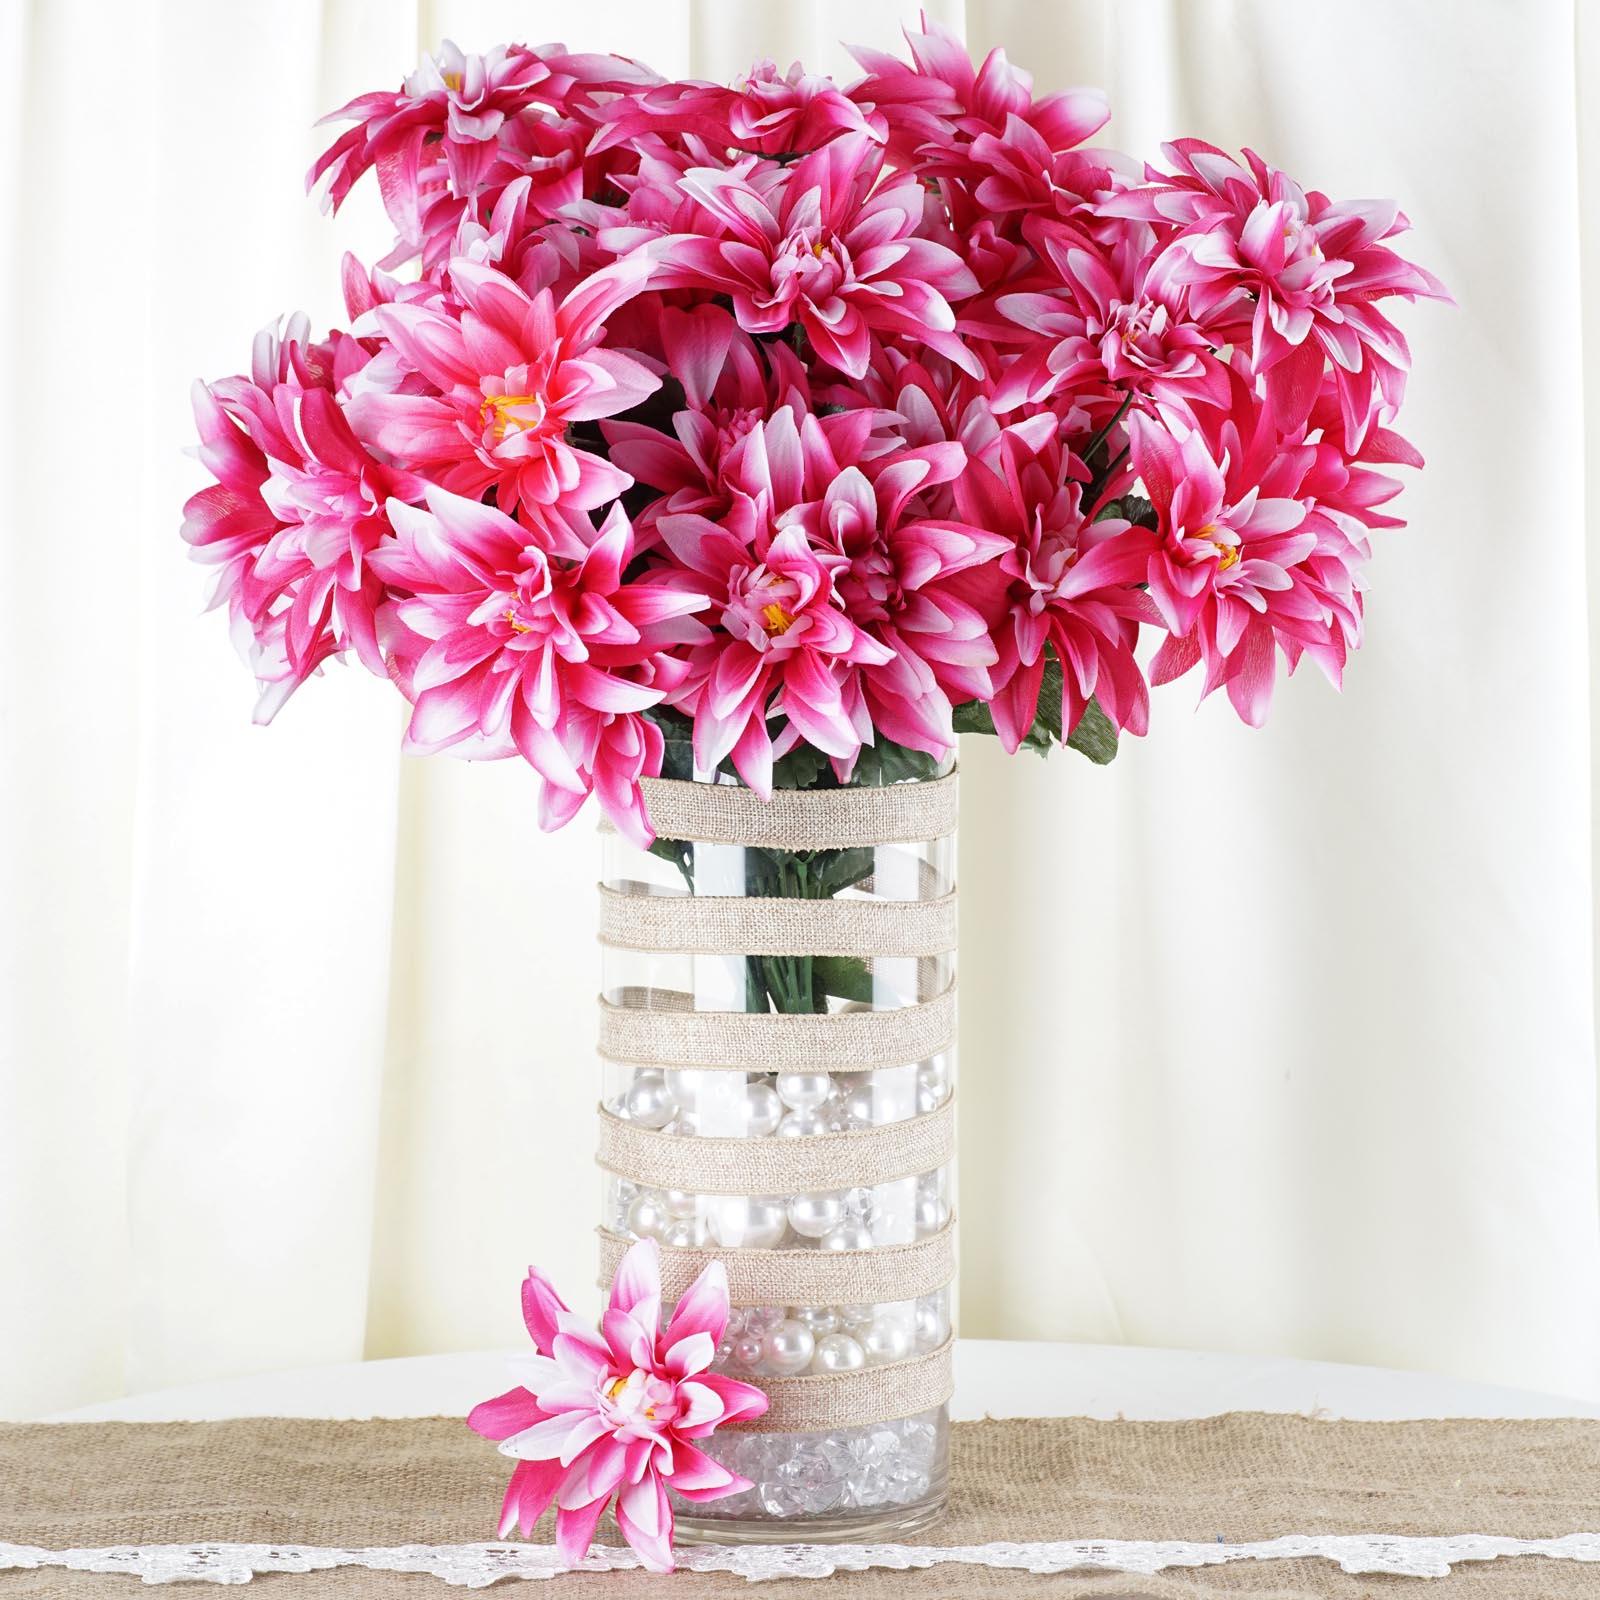 BalsaCircle 56 Silk Dahlia Artificial Flowers - DIY Home Wedding Party Bouquets Arrangements Centerpieces